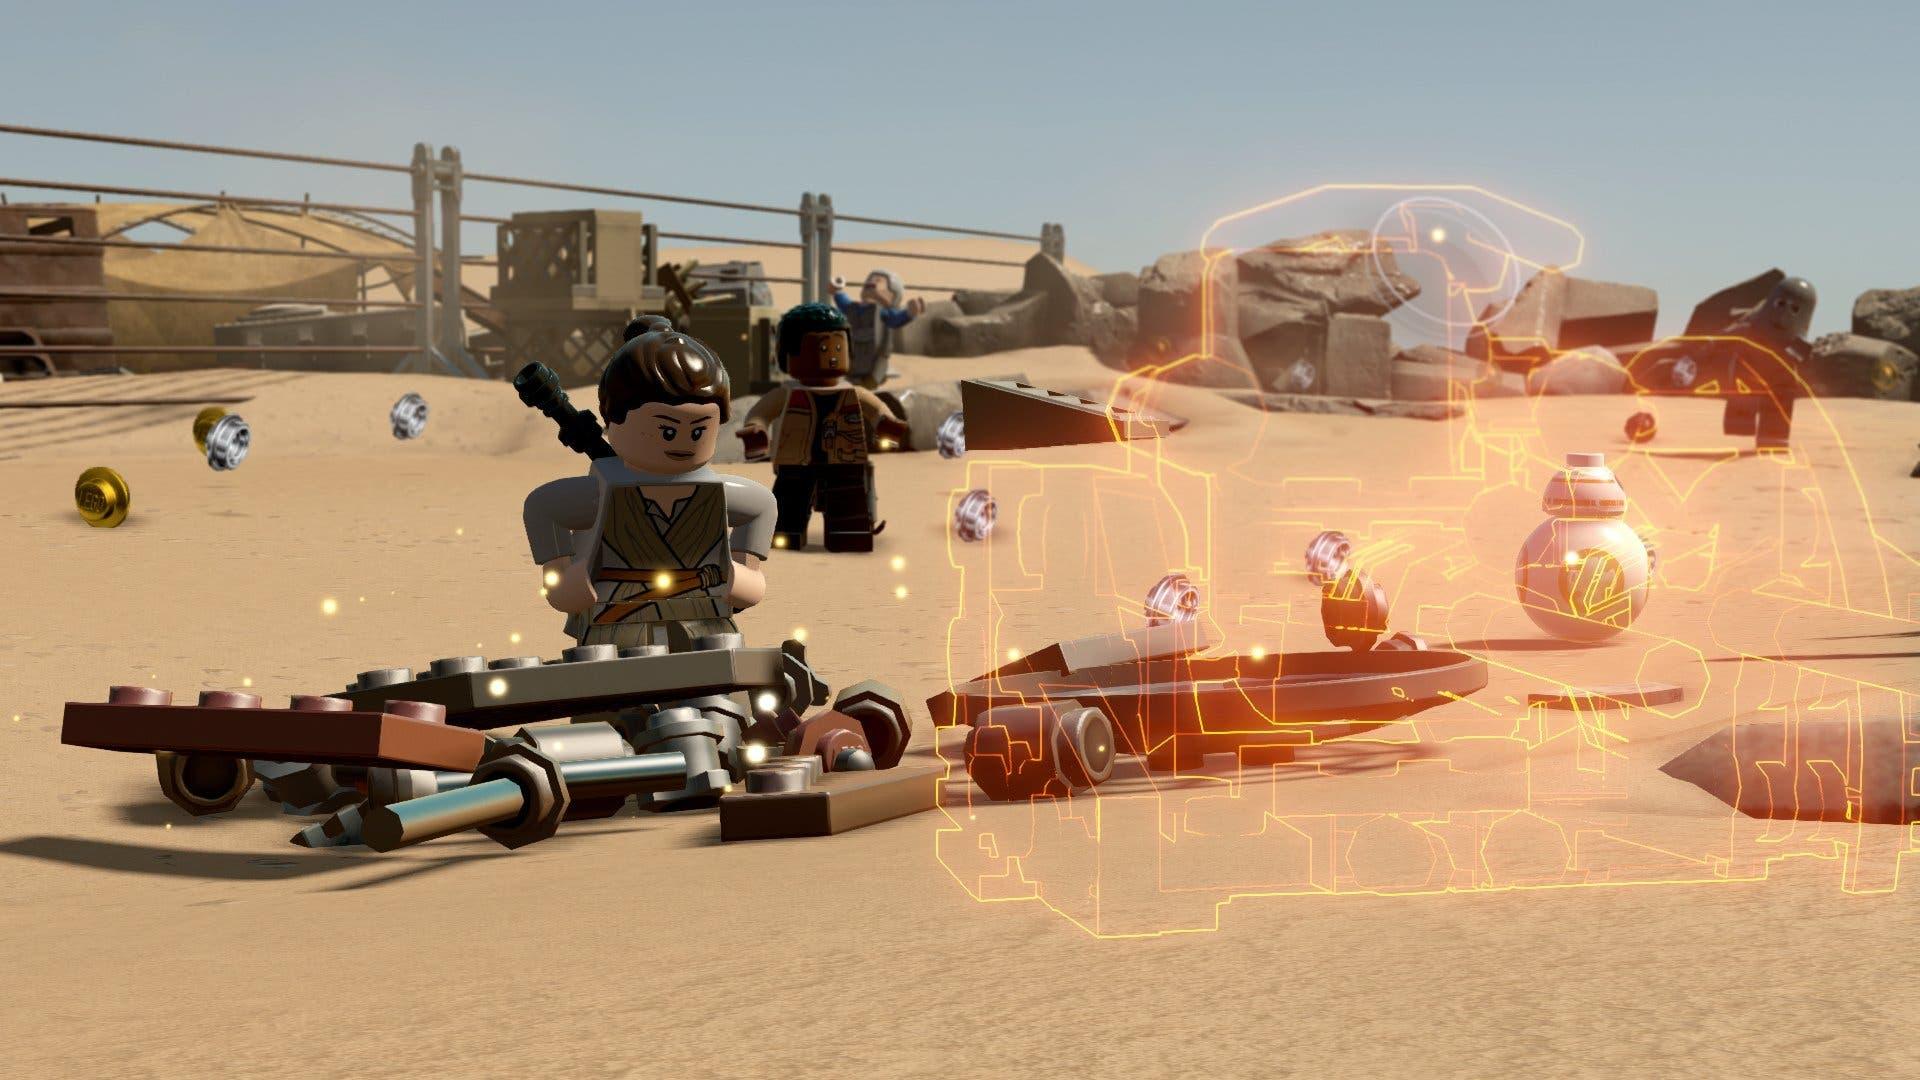 LEGO Star Wars The Force Awakens construcciones